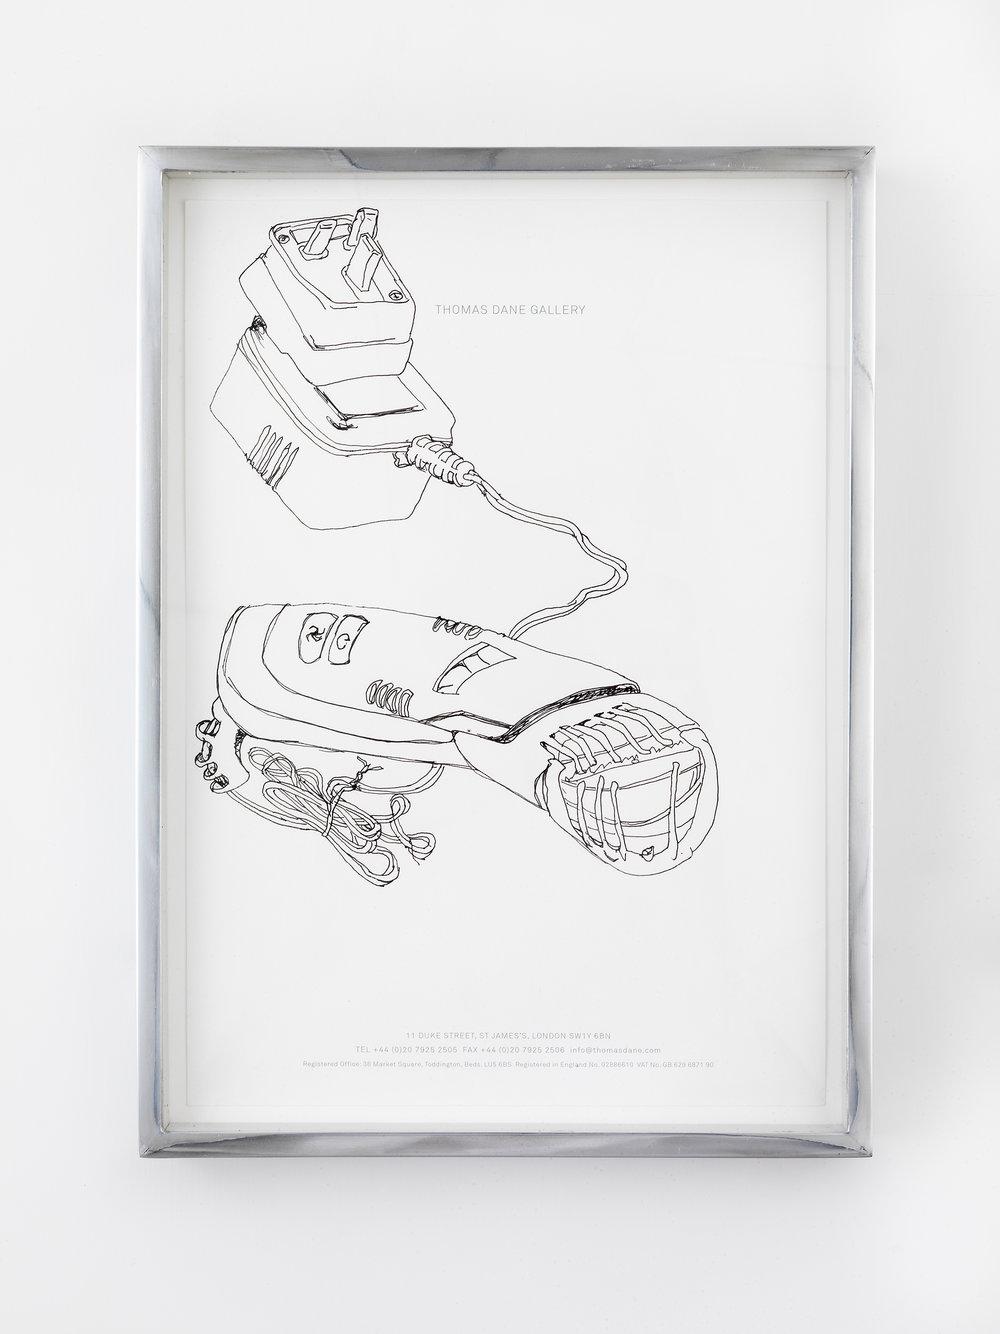 Philips Norelco TR980 Turbo Vacuum Trimmer (broken), Great Arthur House, #44, Fann Street, Golden Lane Estate, London, EC1, September 18, 2014   2014  Ink on paper  10 x 12 1/2 inches